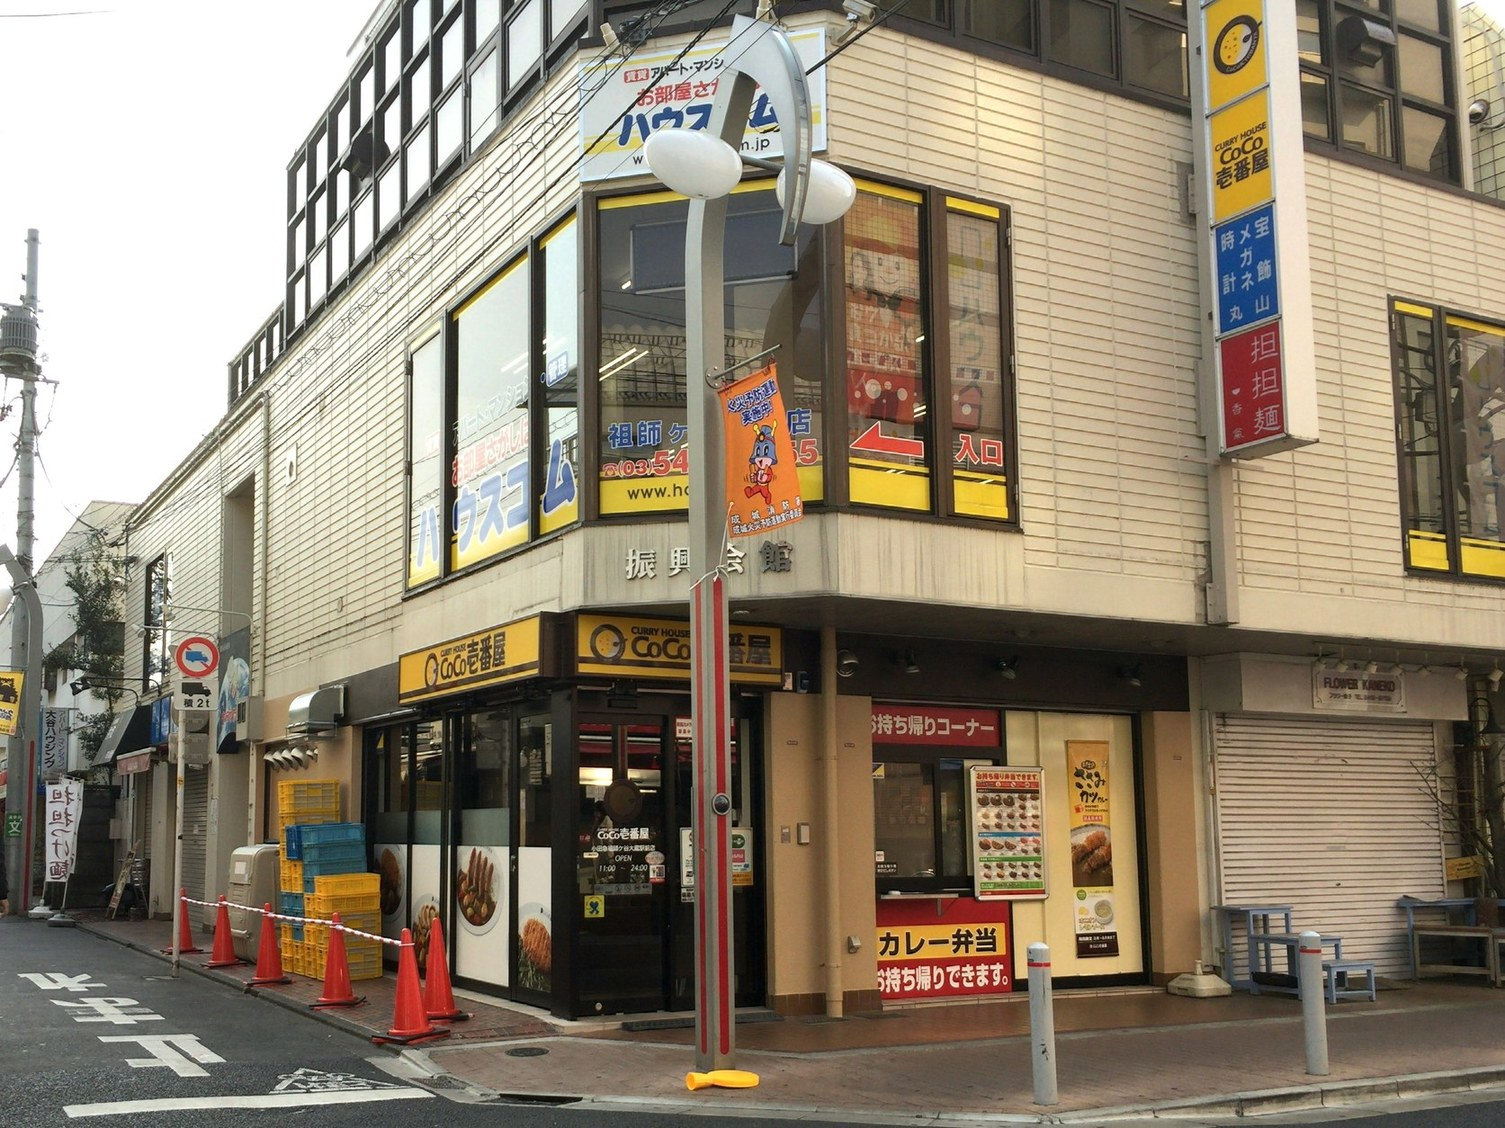 CoCo壱番屋 小田急祖師ヶ谷大蔵駅前店